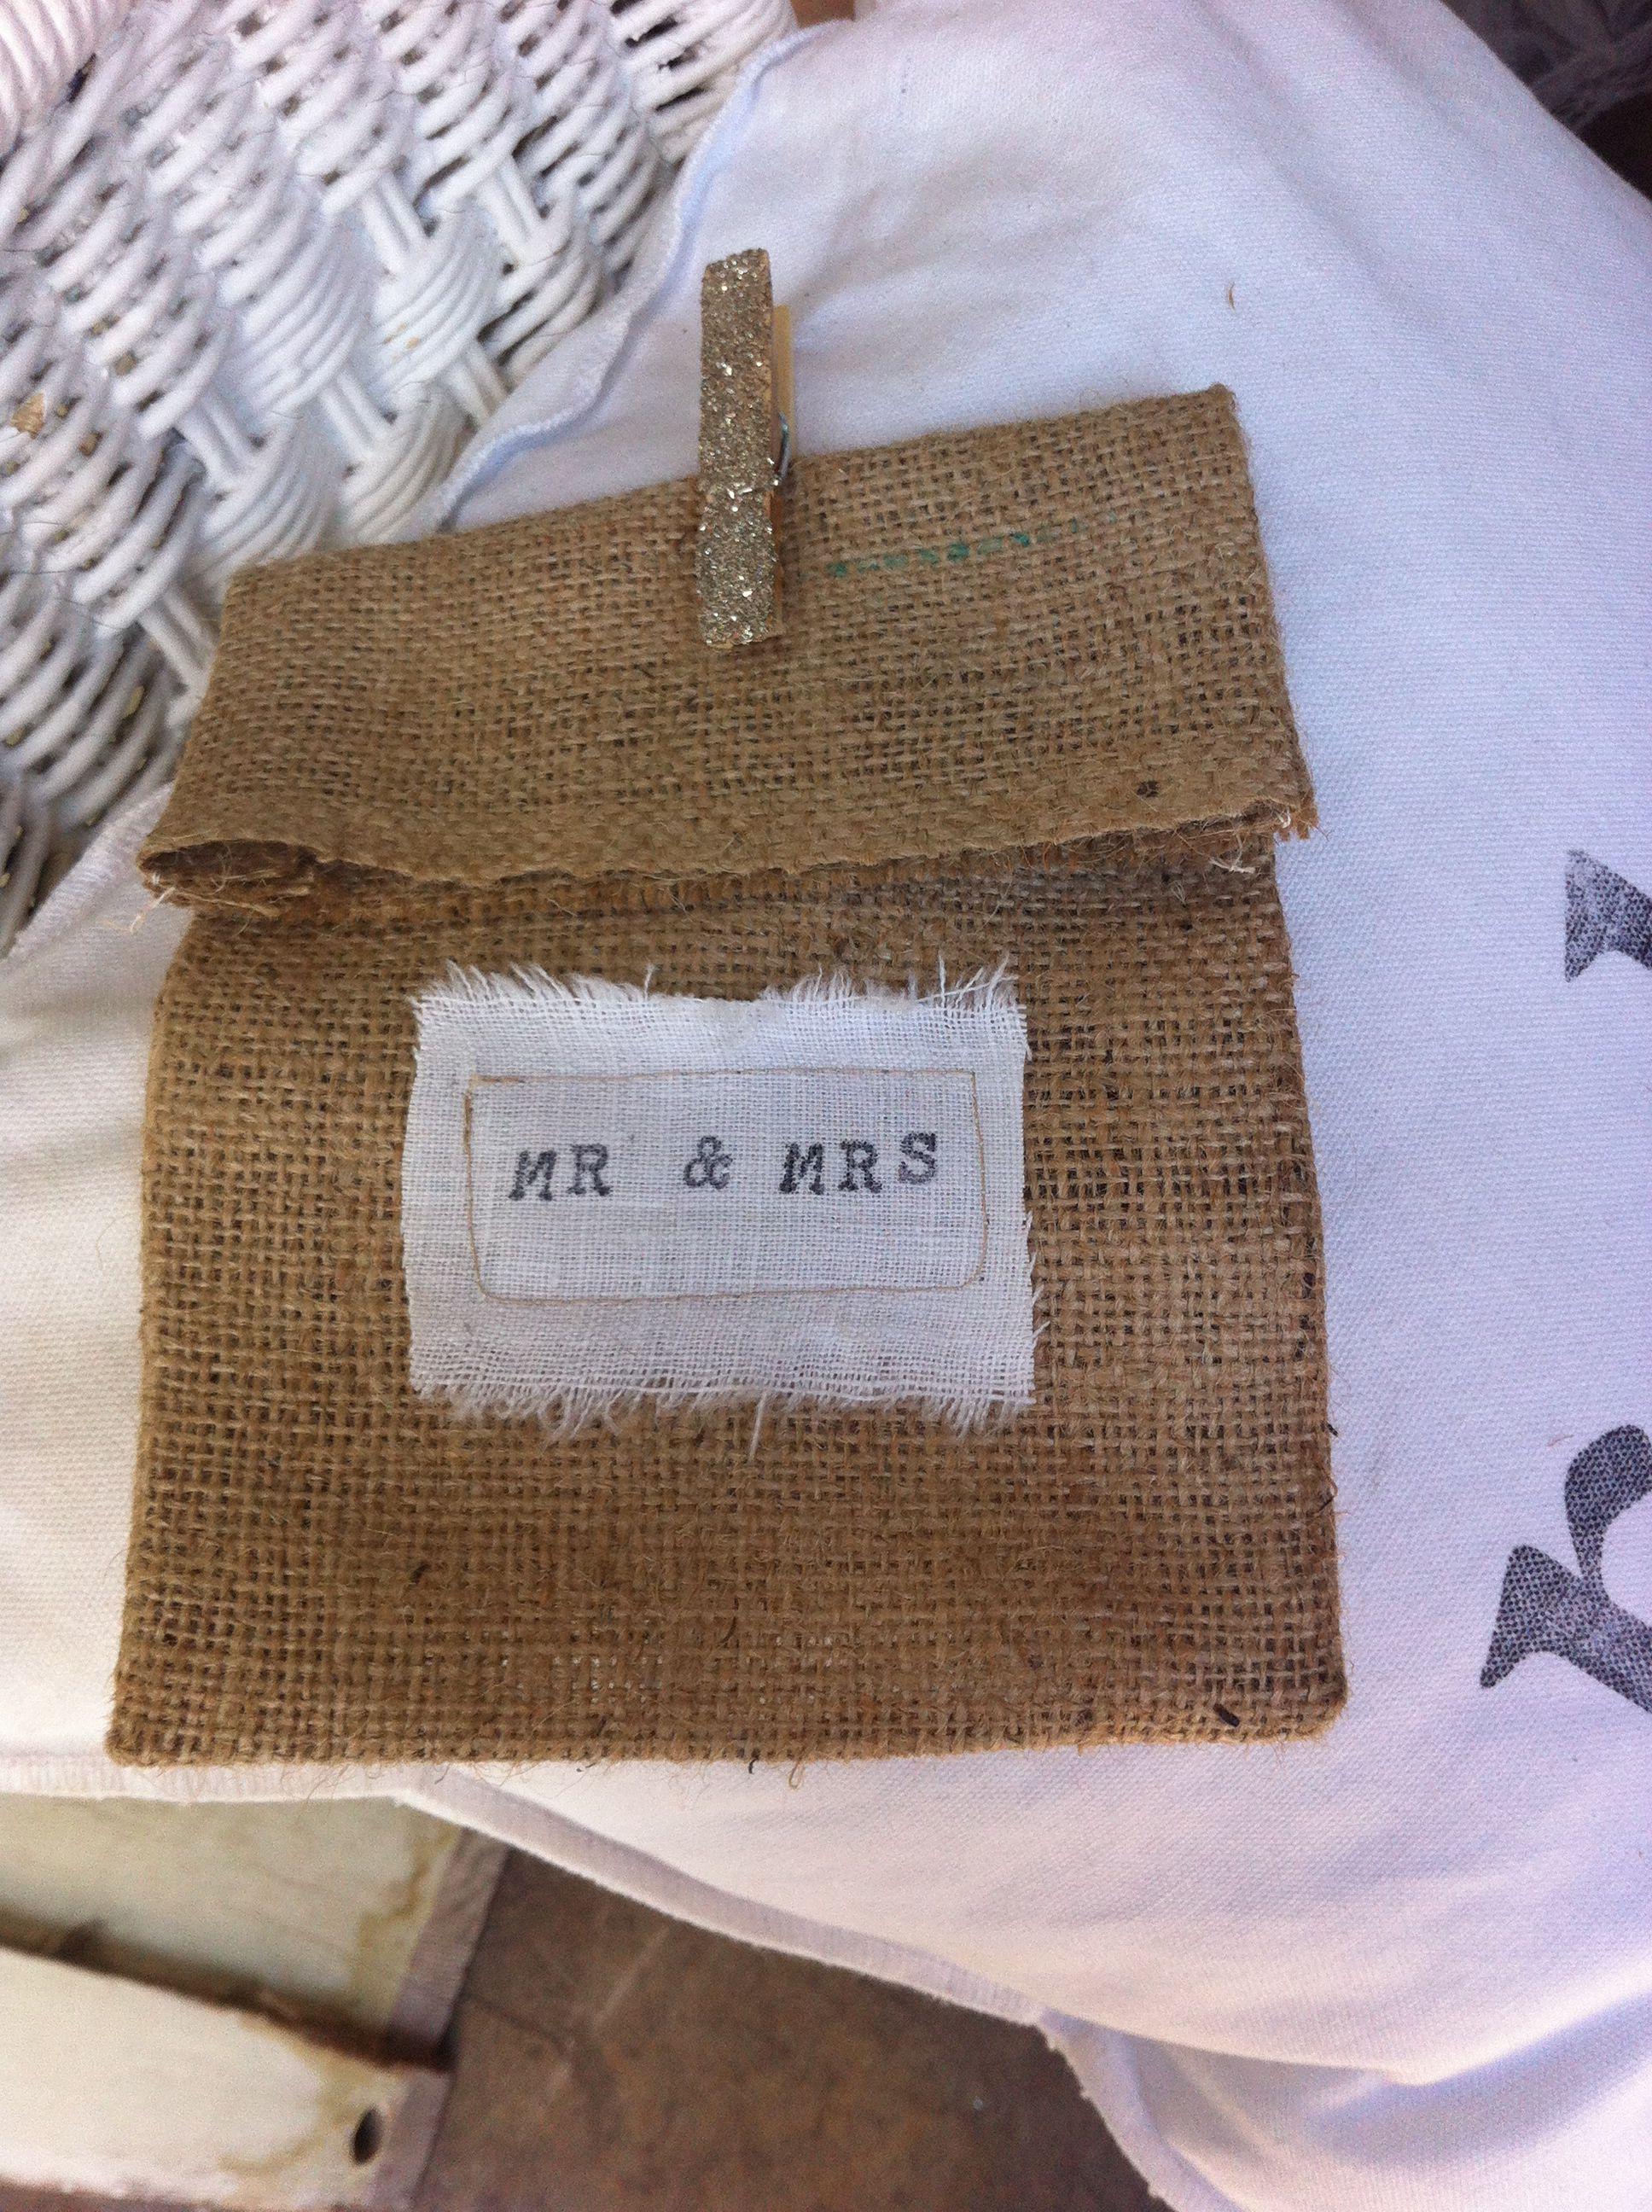 Wedding / Favor burlap bag & clothespin Sourvenir ideas Pinterest